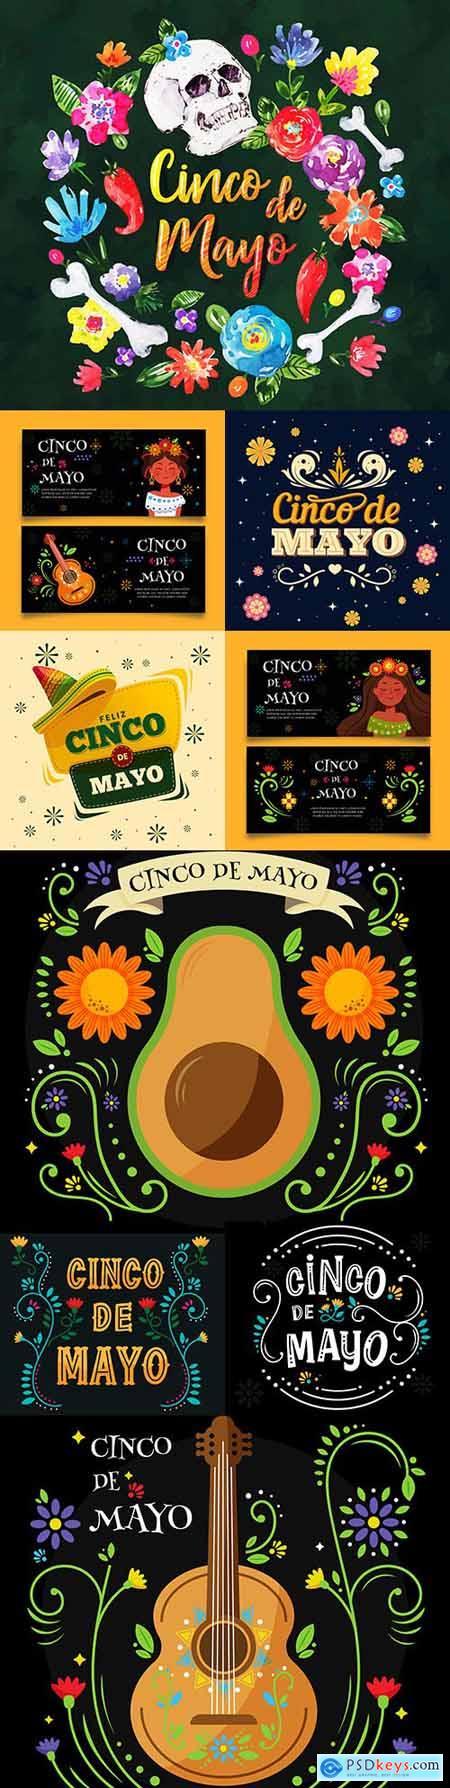 Synco de Mayo Mexican holiday premium illustration 3